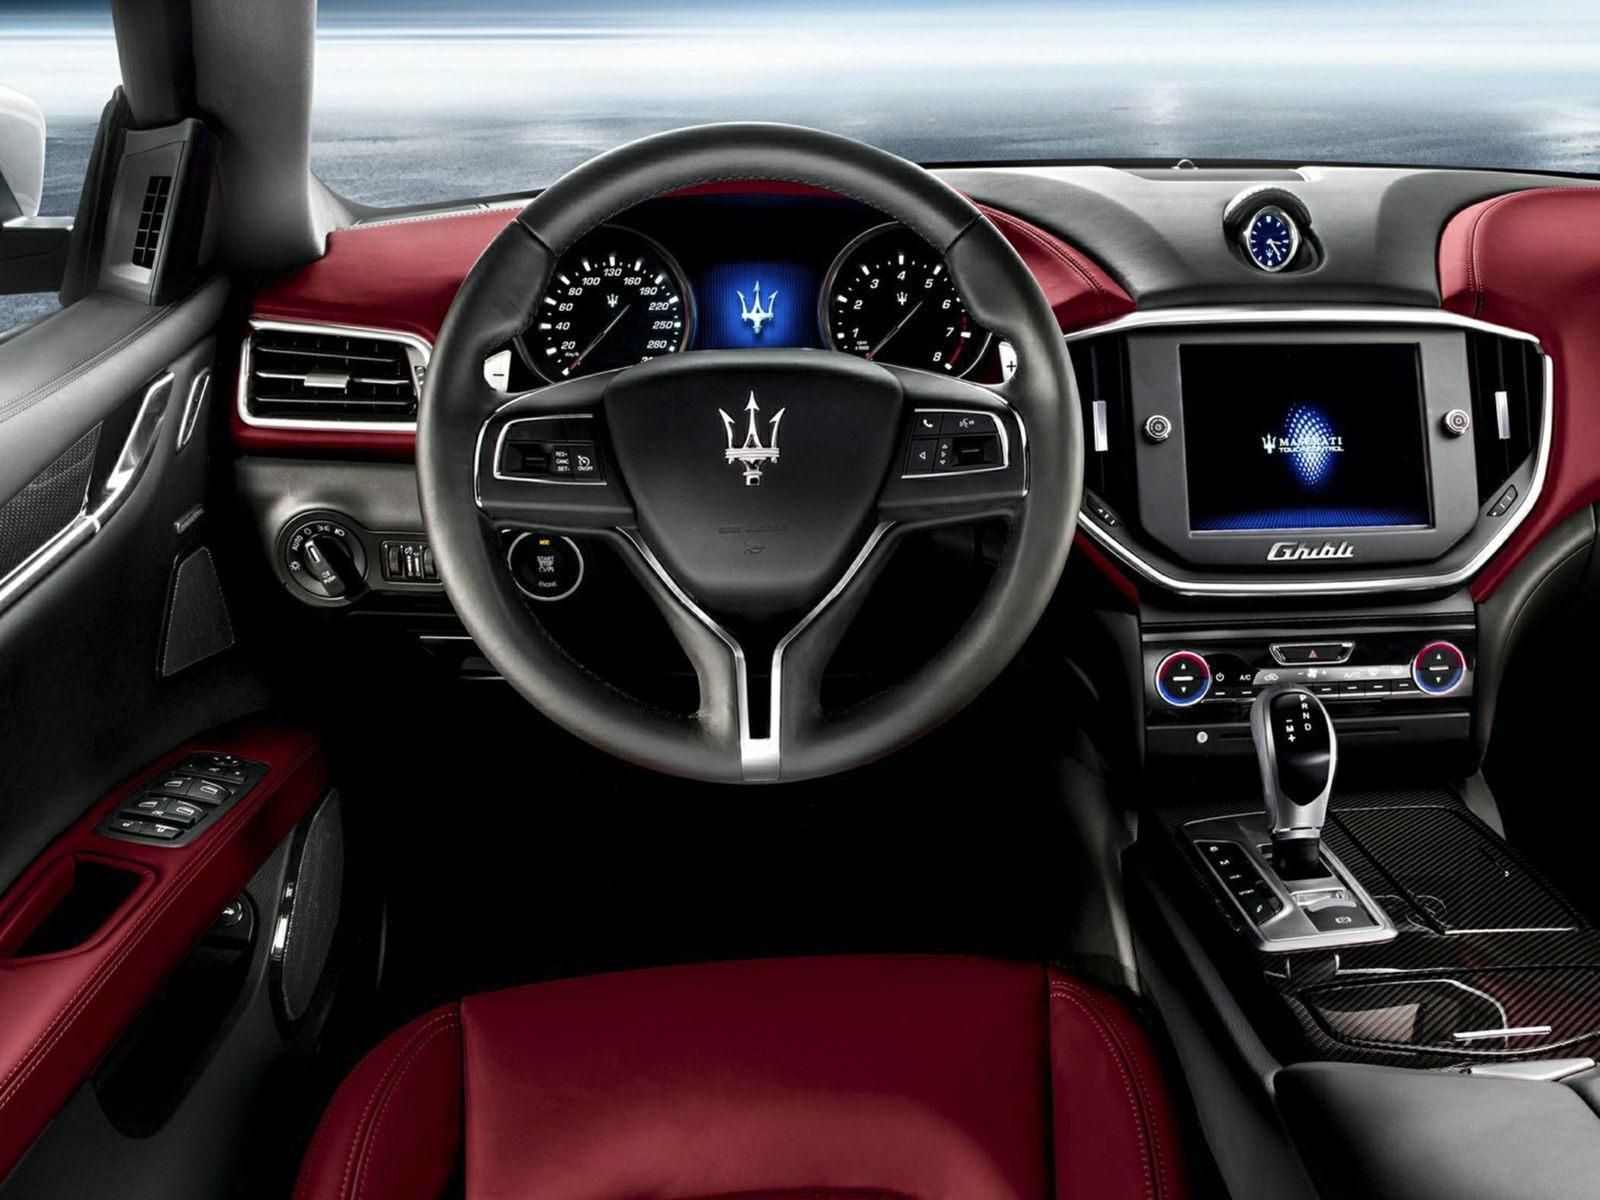 2014 Maserati Ghilbi Interior